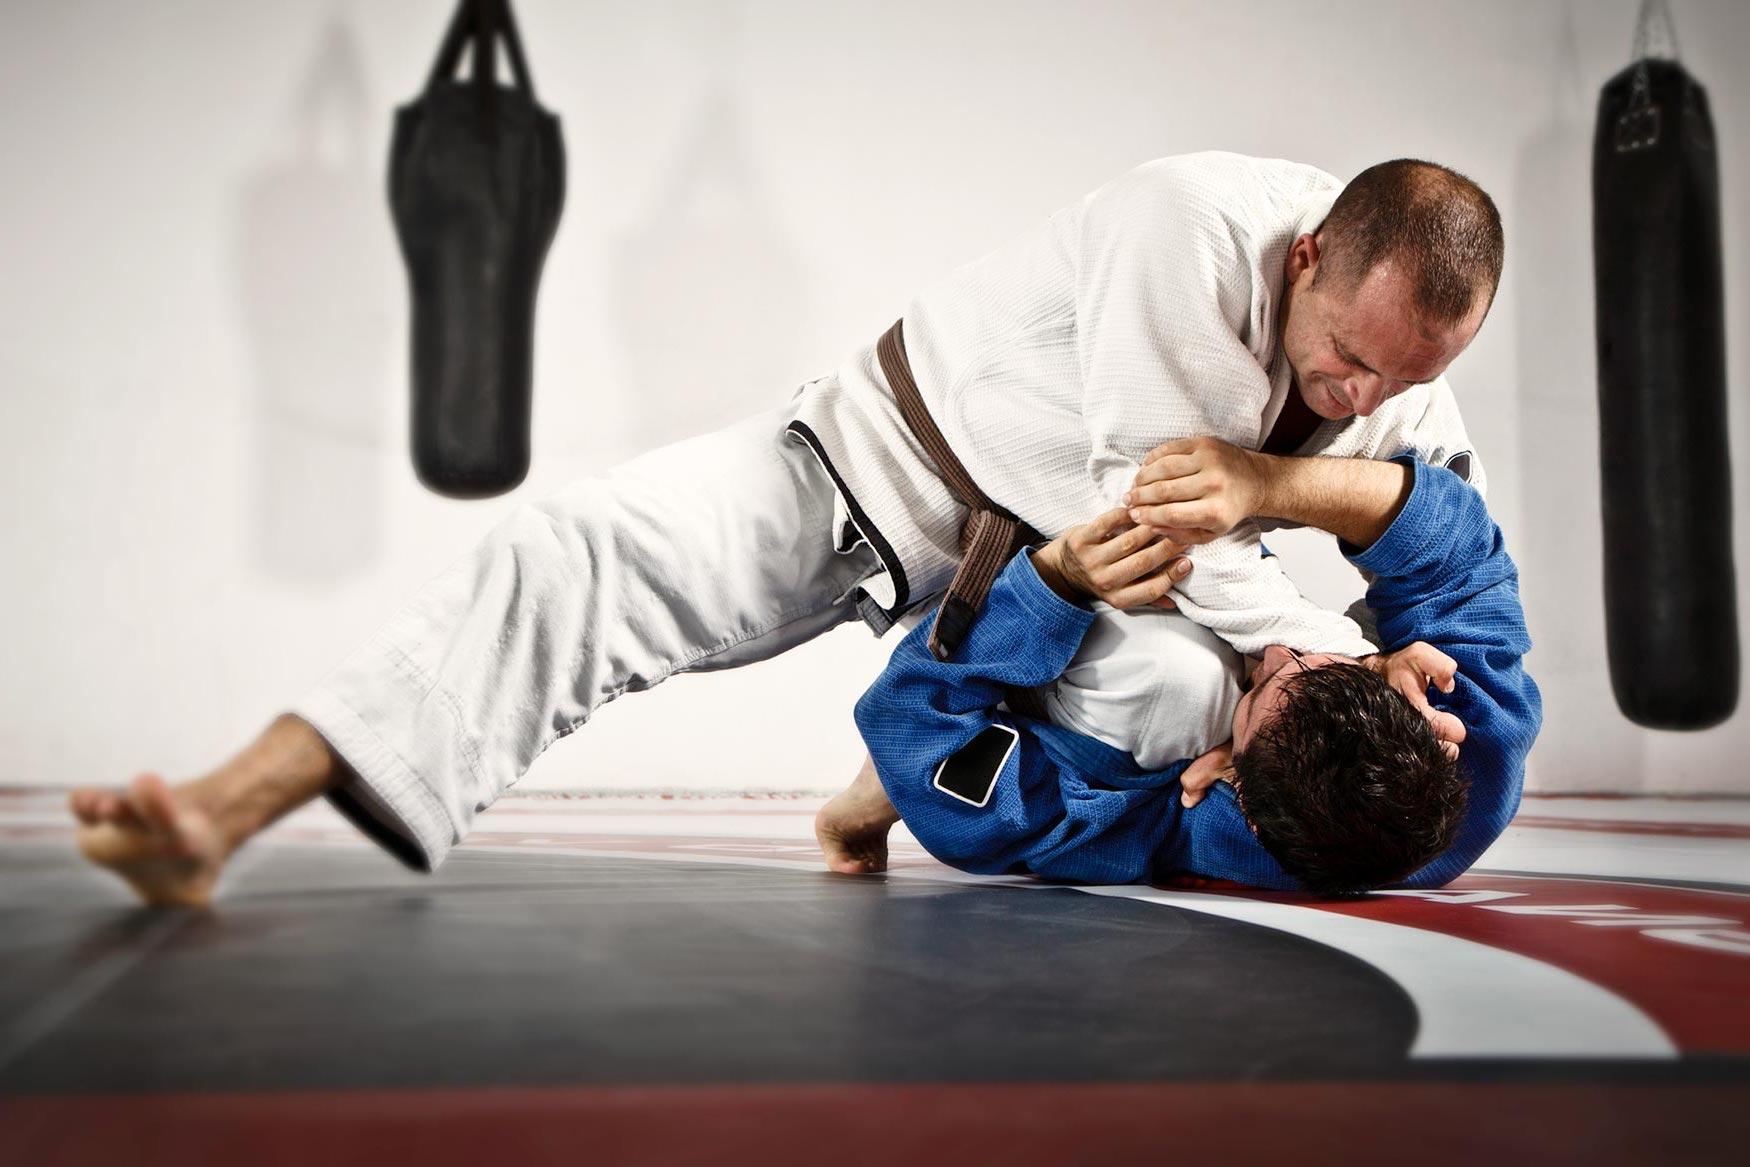 Brazilian Jiu Jitsu/Judo